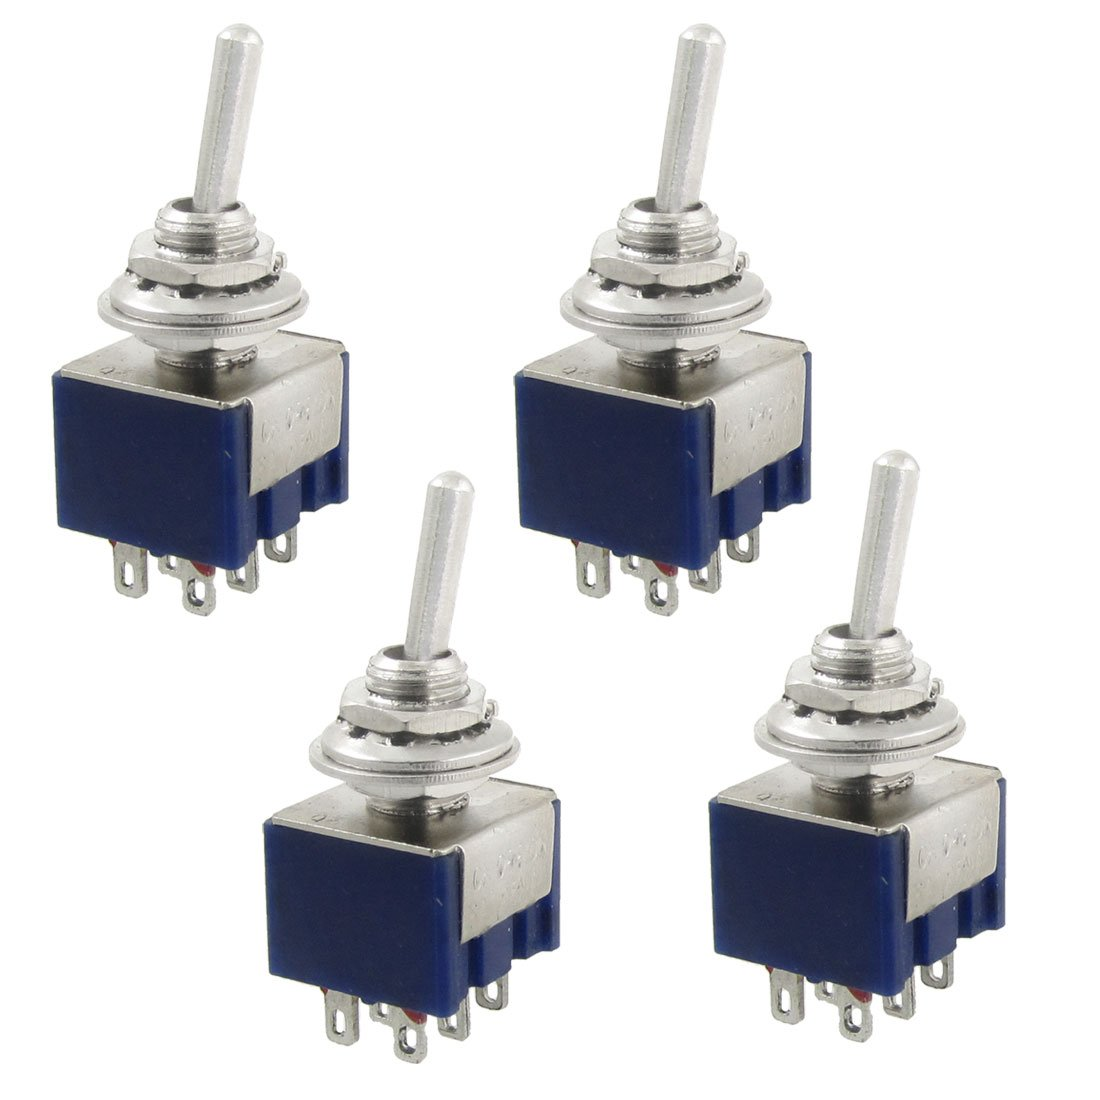 sourcingmap 4 piezas AC 125V 6A 6 terminales On/Off/On 3 Posició n Interruptor de palanca en miniatura DPDT a12040900ux0597